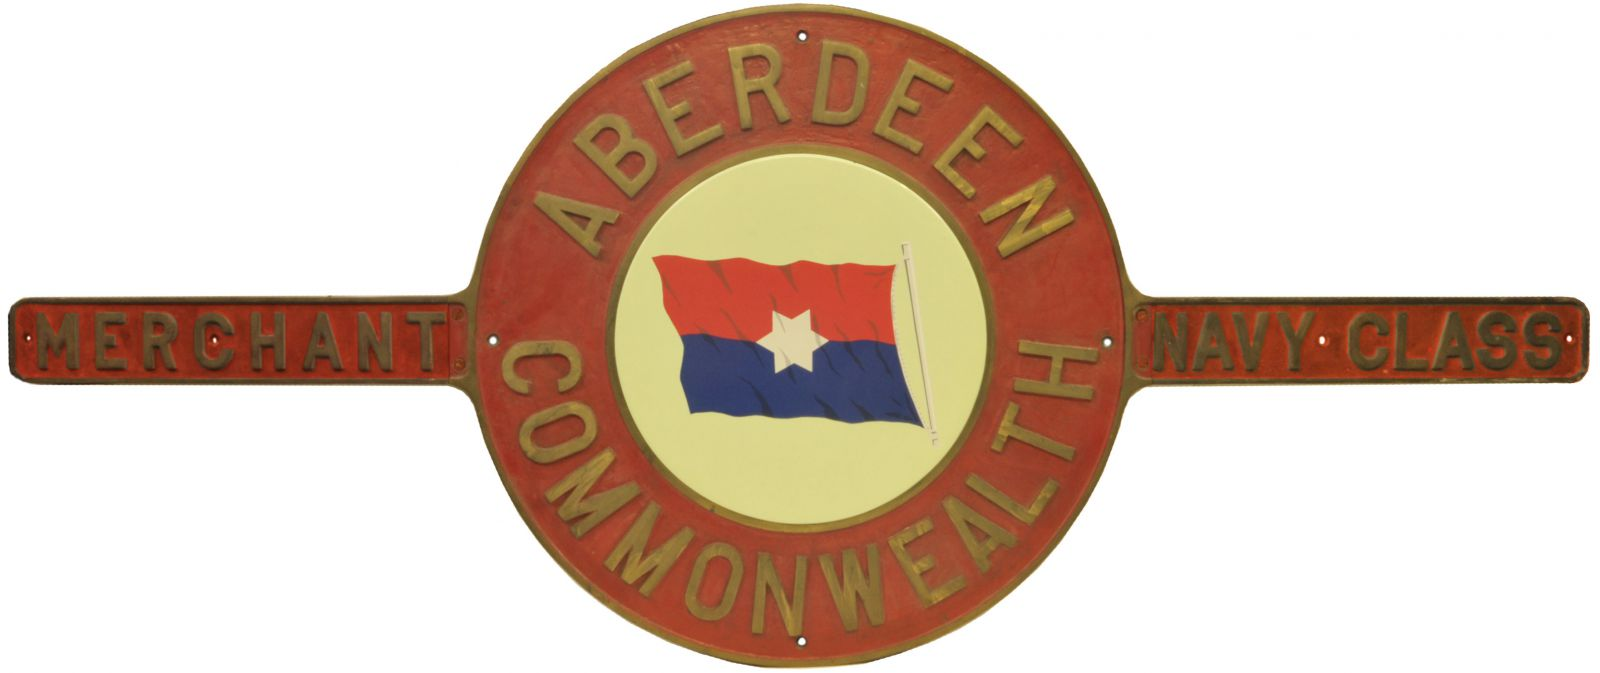 Lot 42 - Railway Locomotive Nameplates, Aberdeen Commonwealth: A nameplate, ABERDEEN COMMONWEALTH, from the